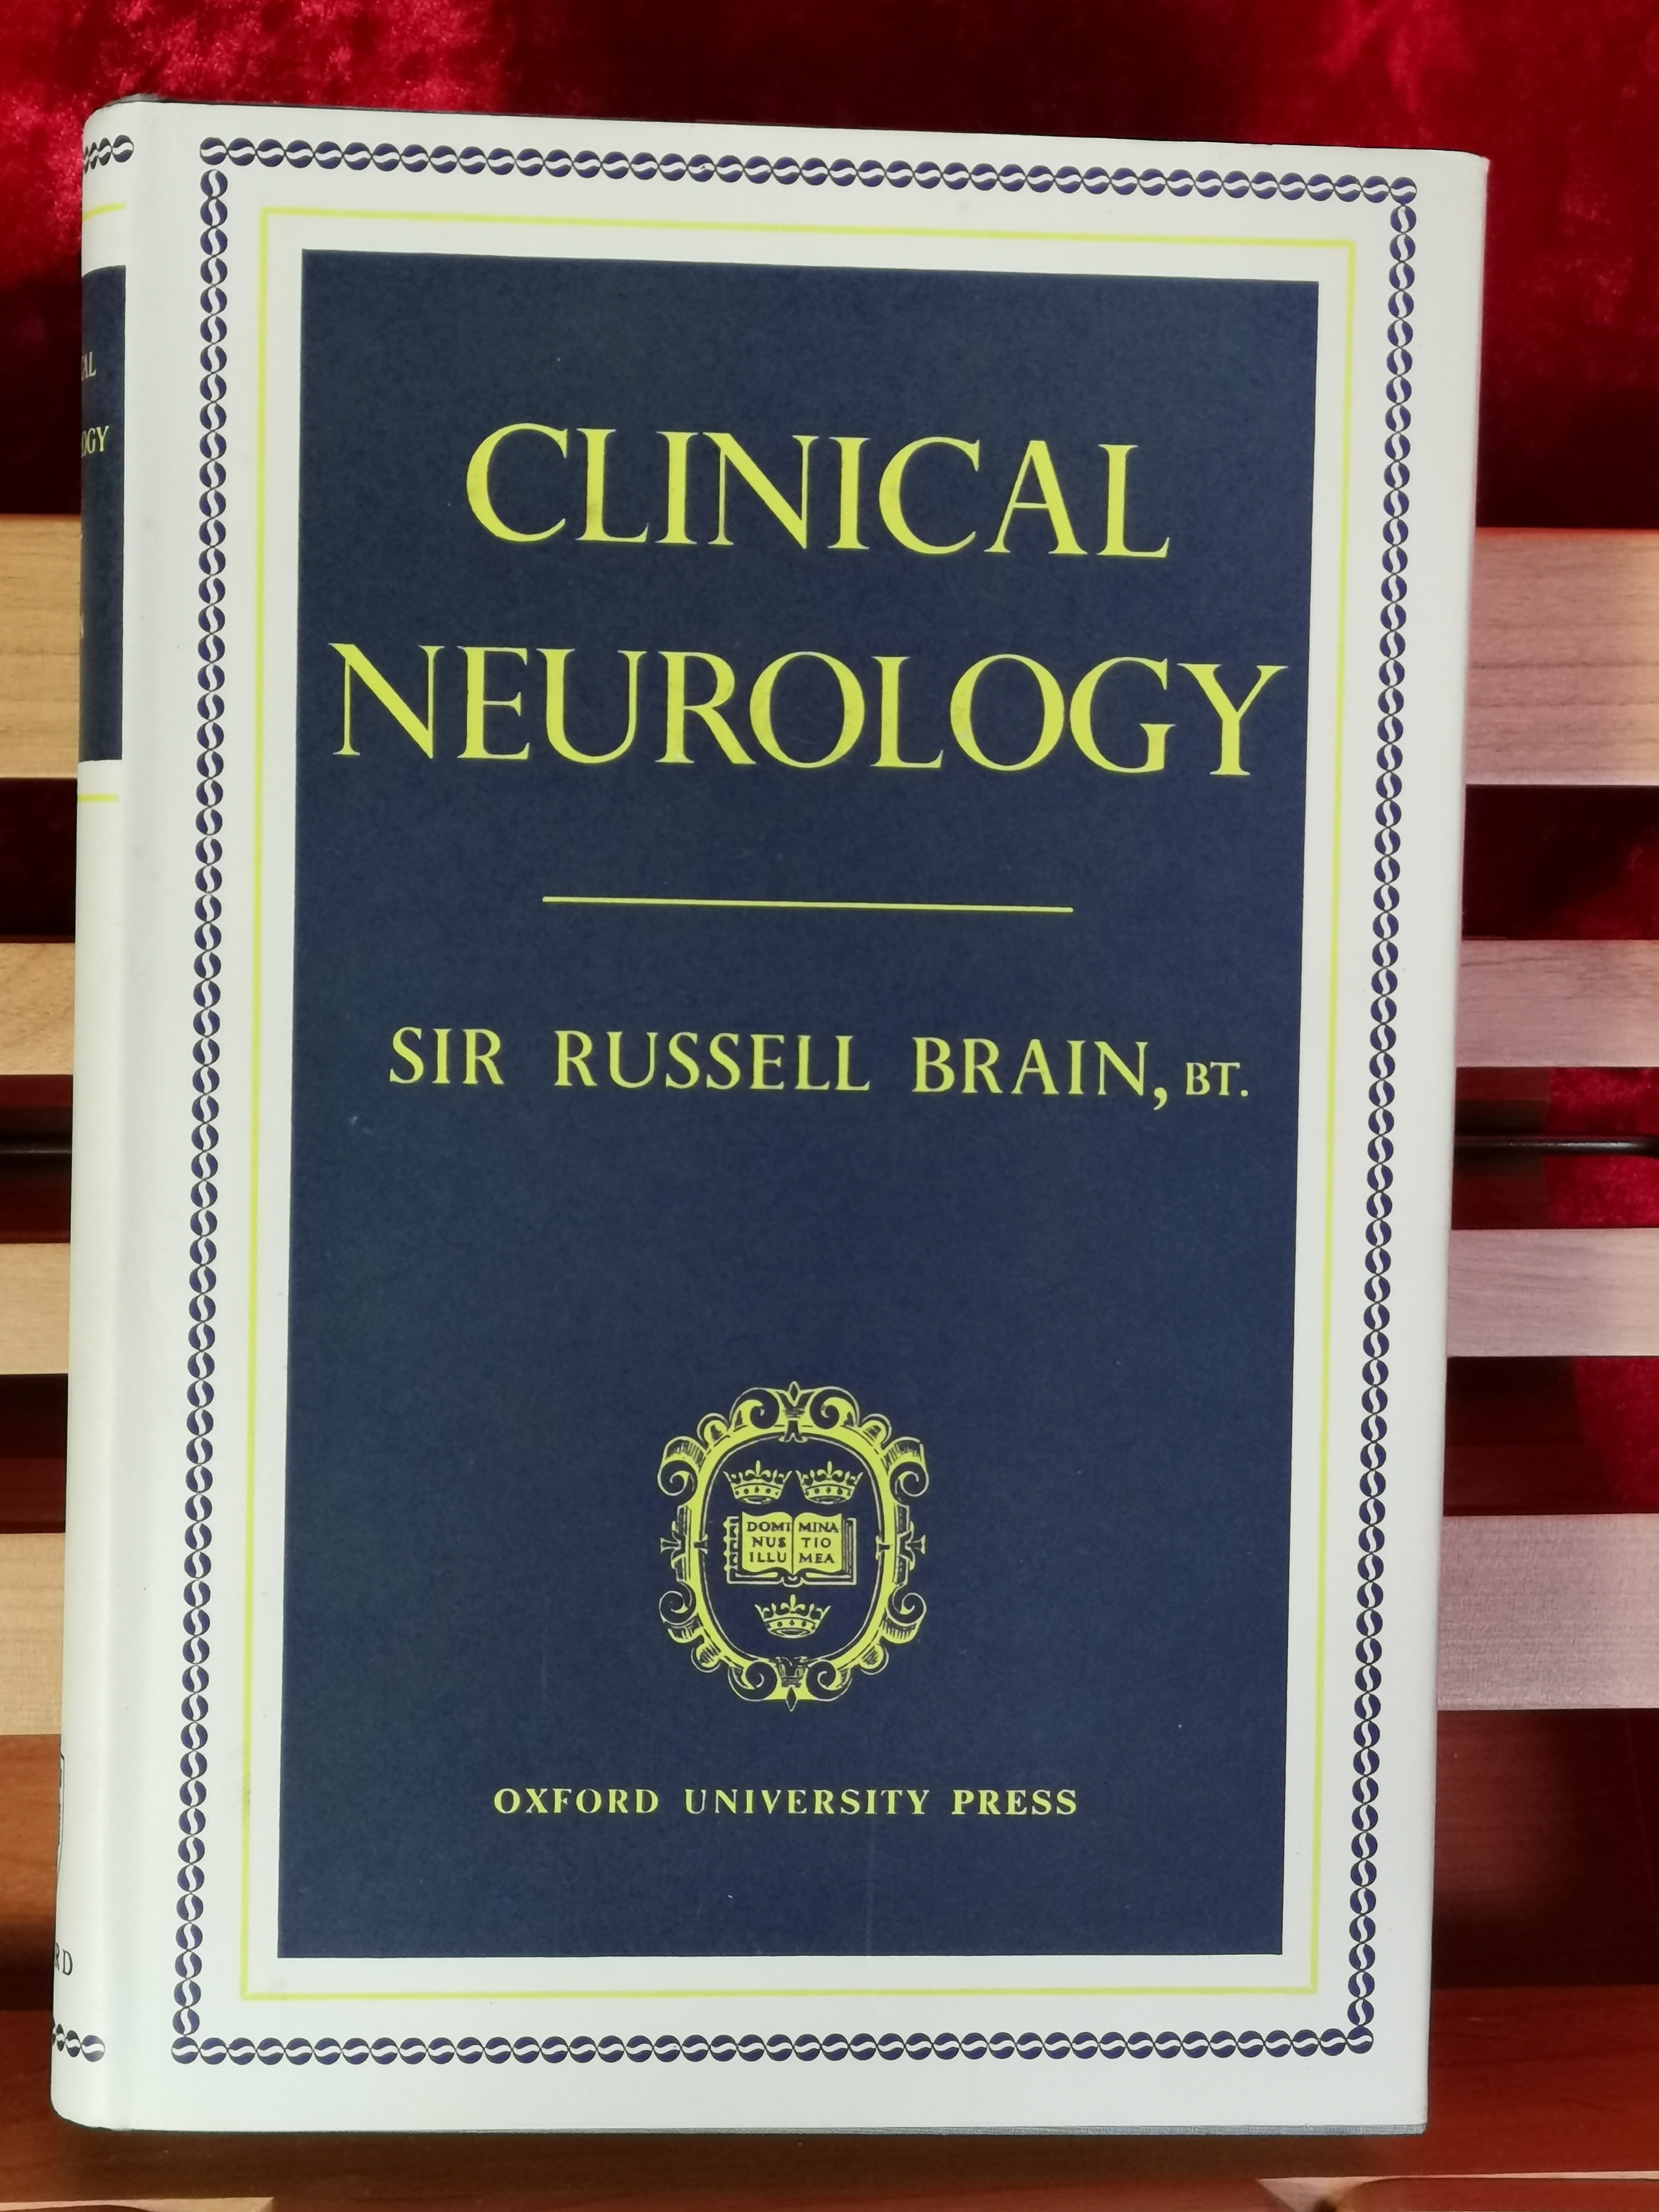 Russell Brain, 1st Baron Brain